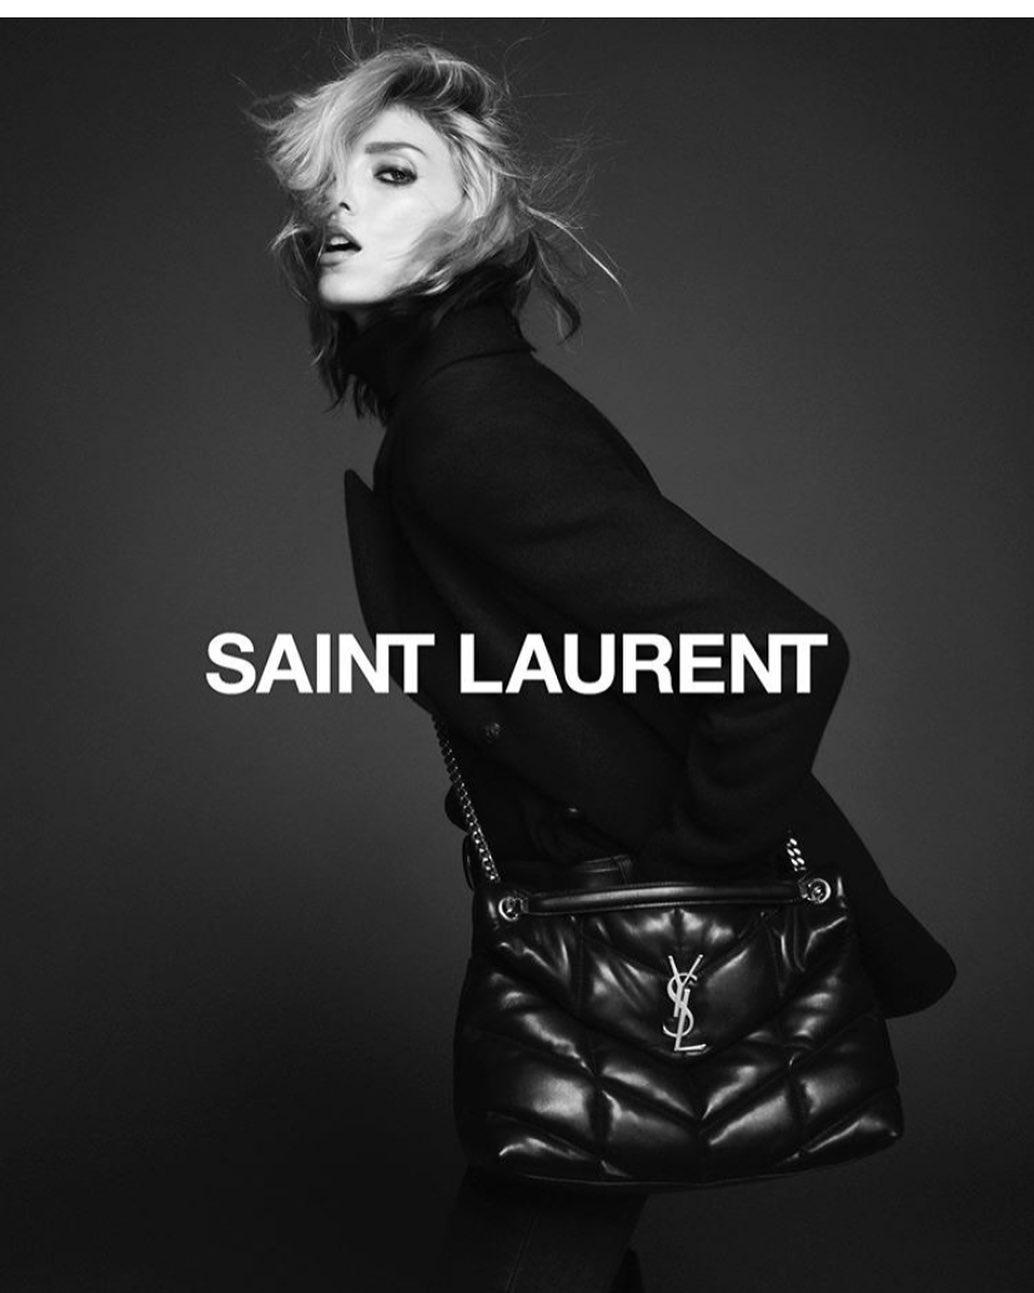 saint_laurent_fall_2019_campaign3.jpg